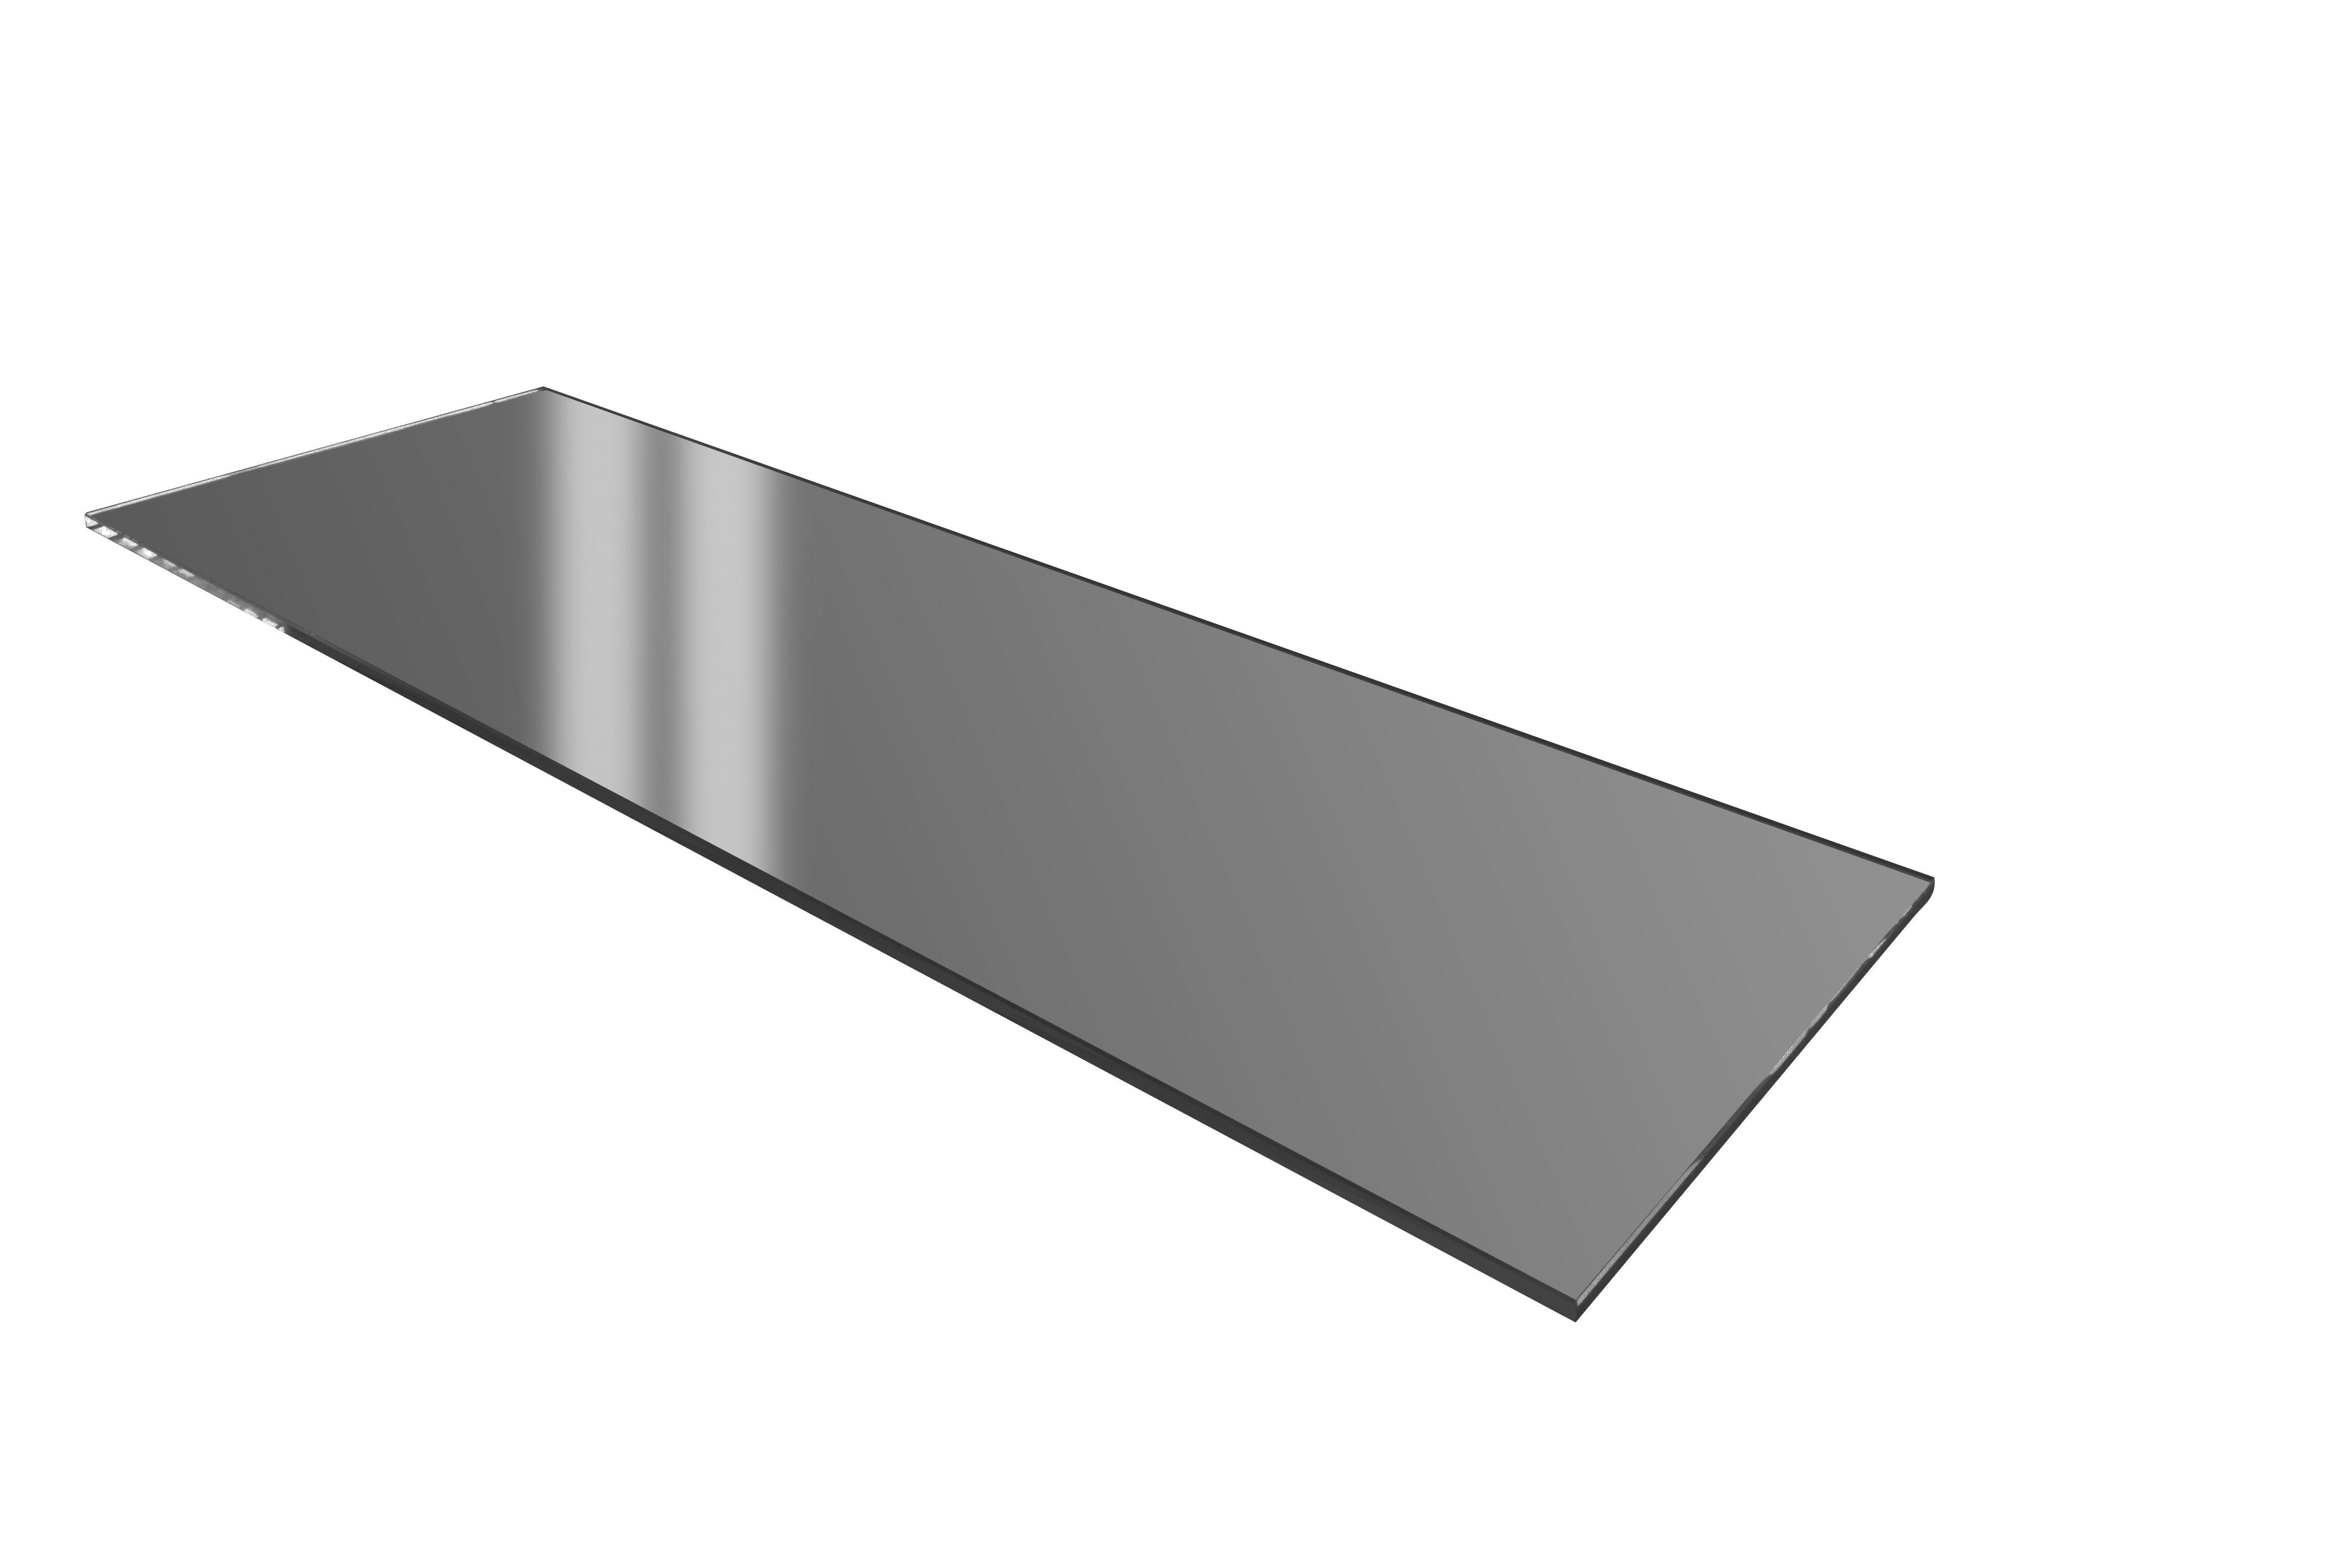 Tvrzené tmavé sklo GN 1/1 - Verlo